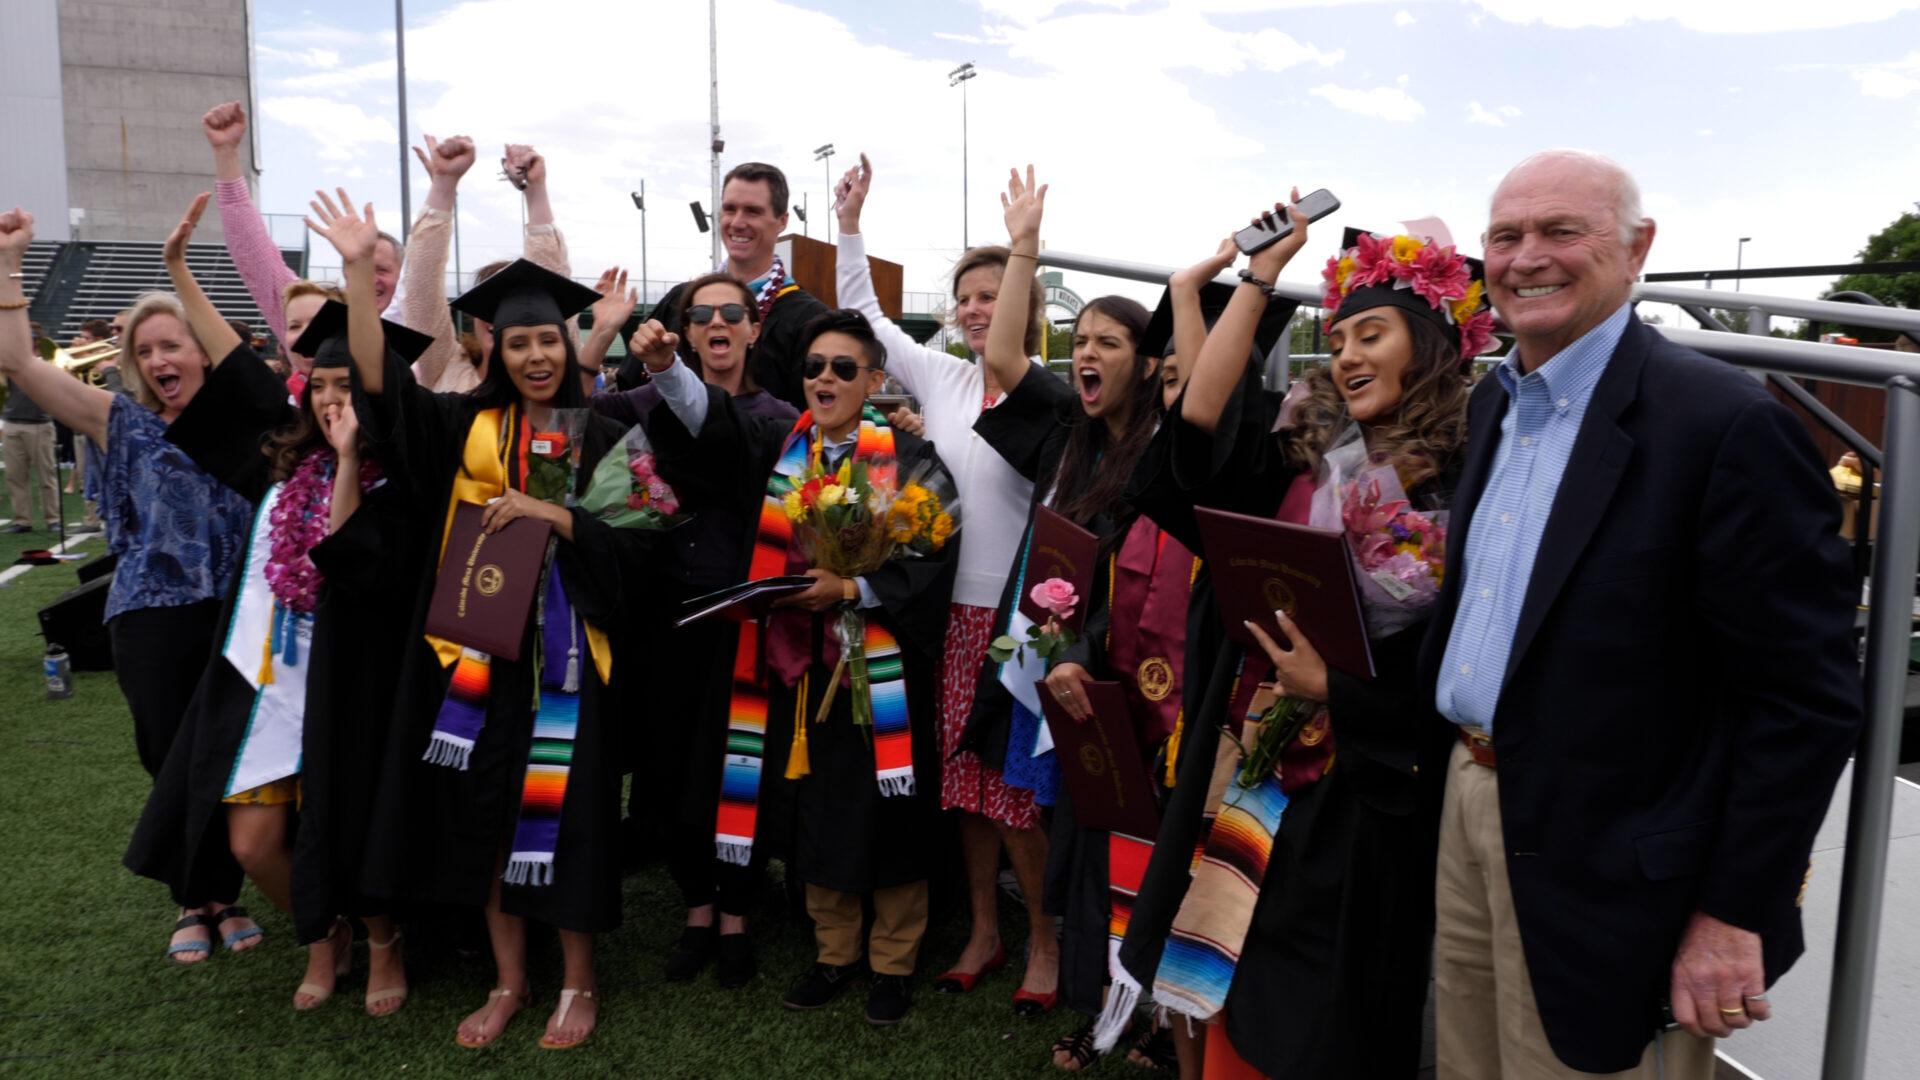 CMU graduates